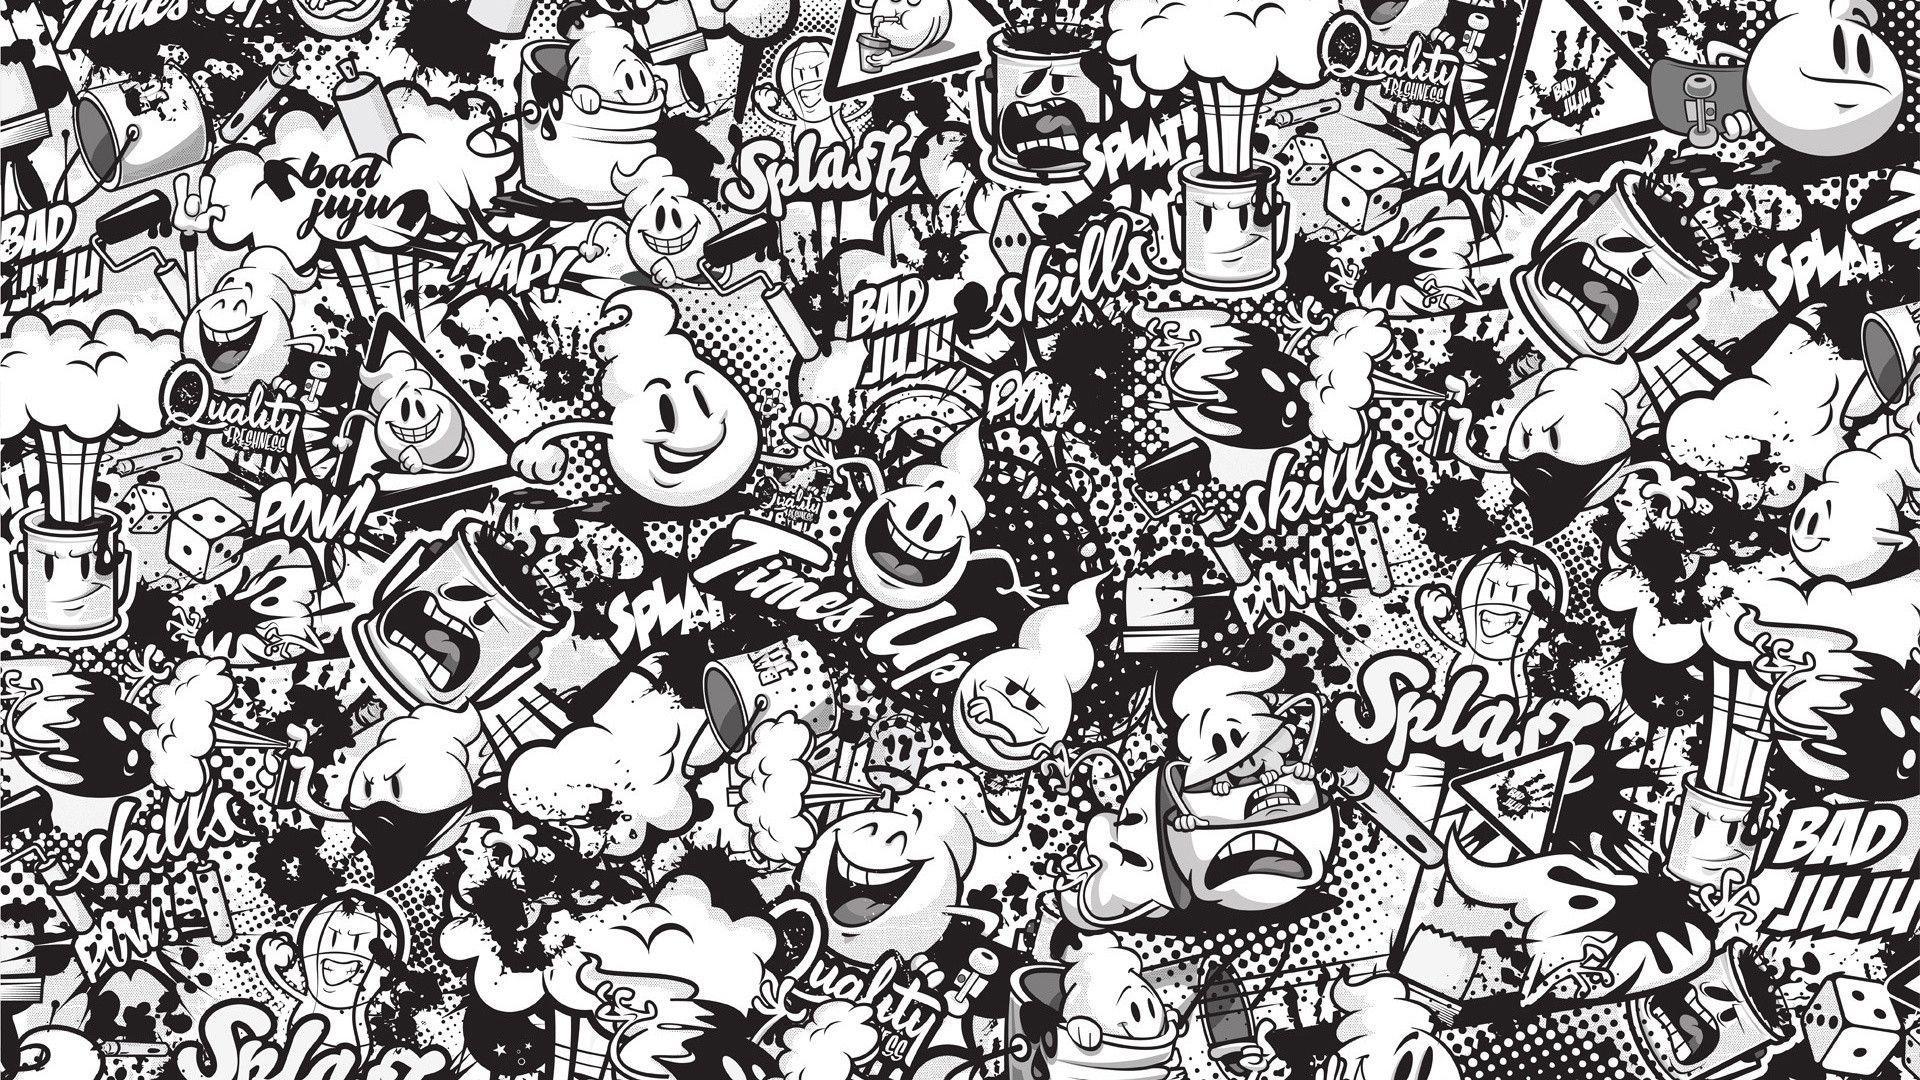 Hd graffiti desktop wallpapers images on graffiti wallpaper hd